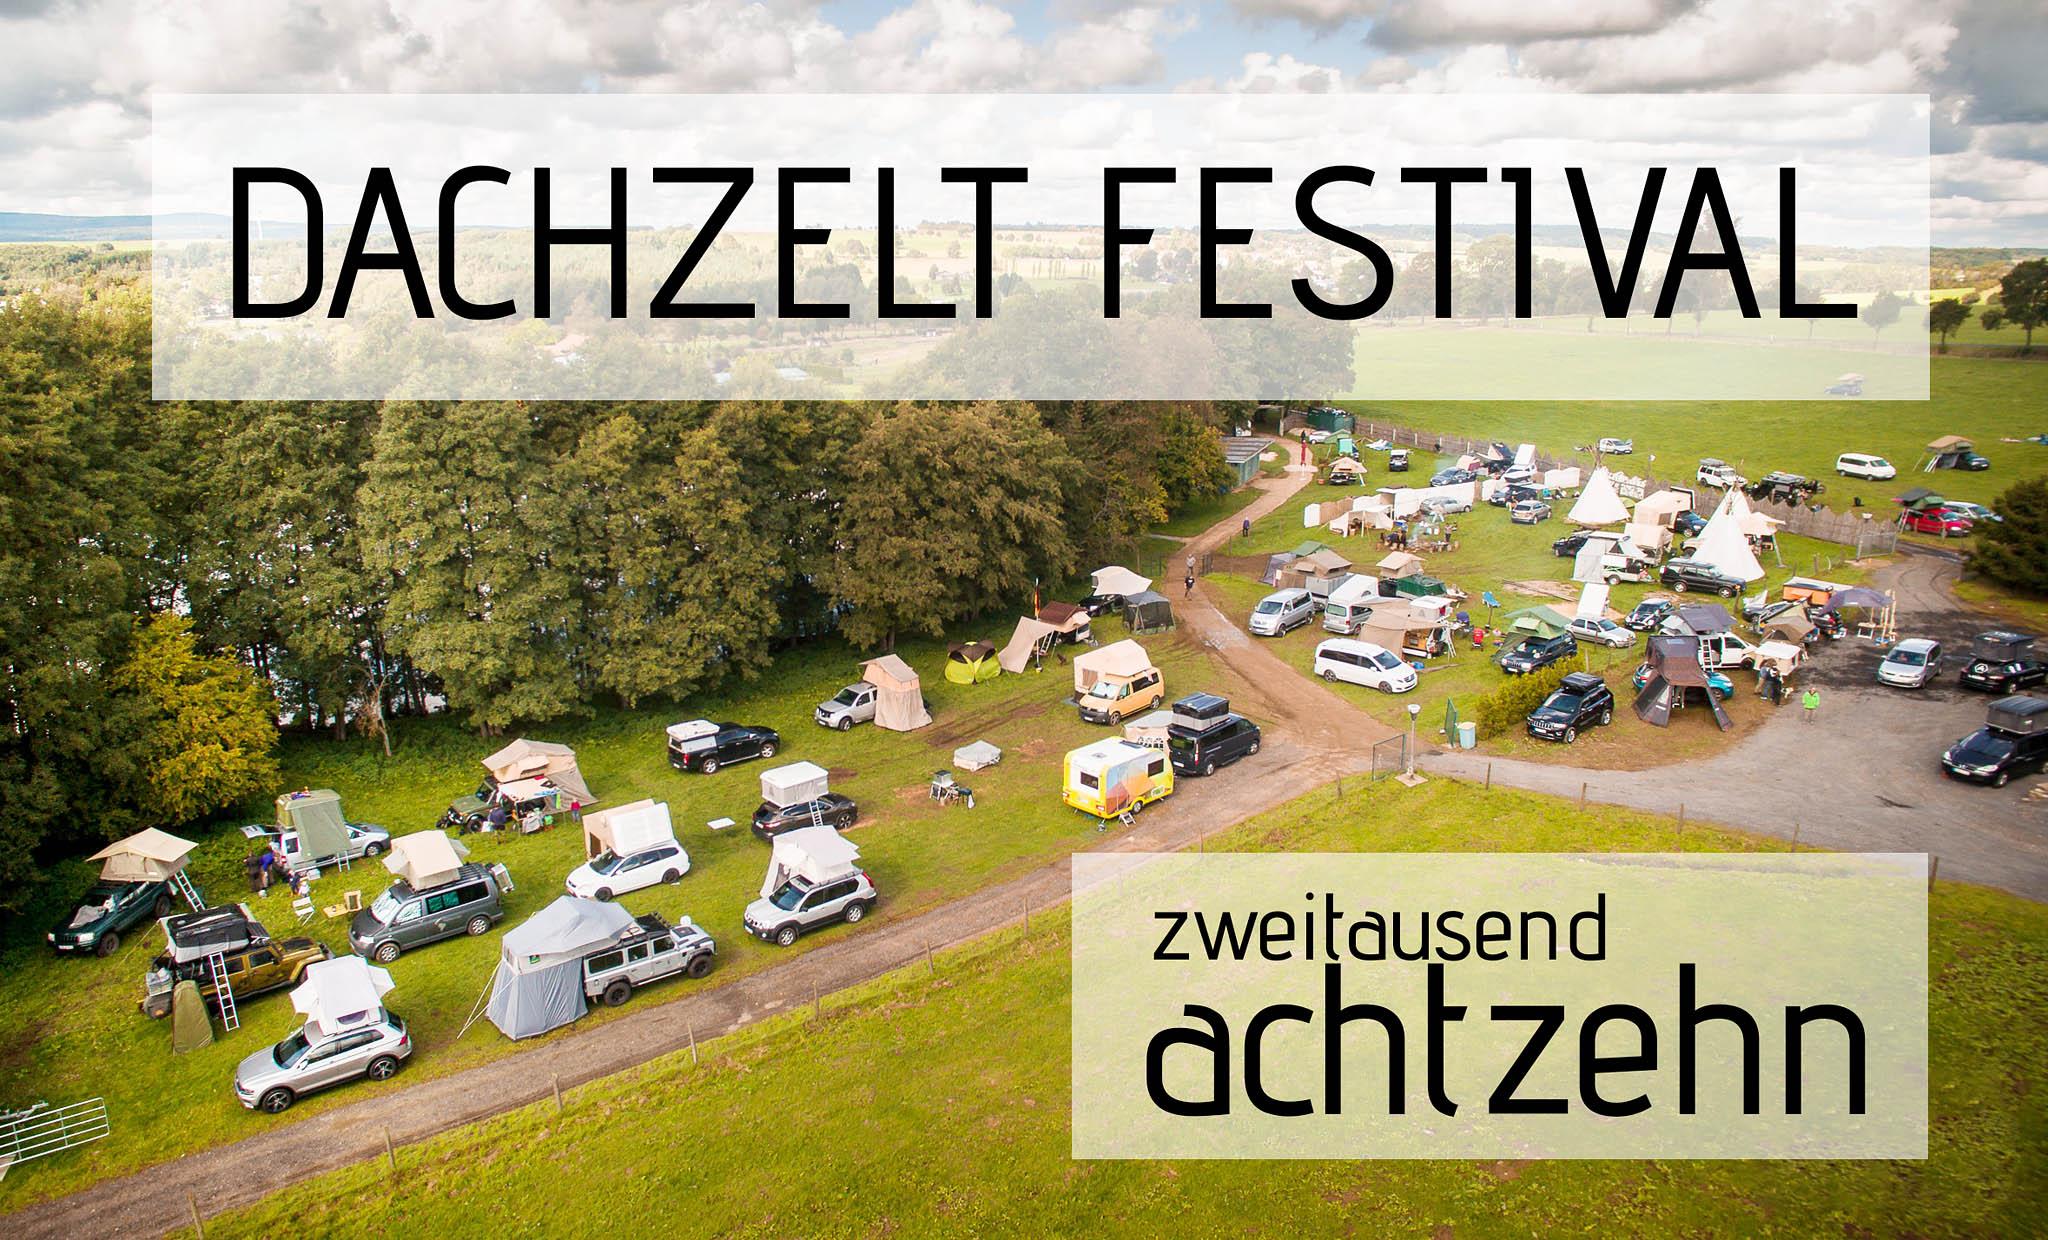 Spüre den Dachzeltnomaden-Spirit hautnah: Komm mit zum DACHZELT FESTIVAL 2018